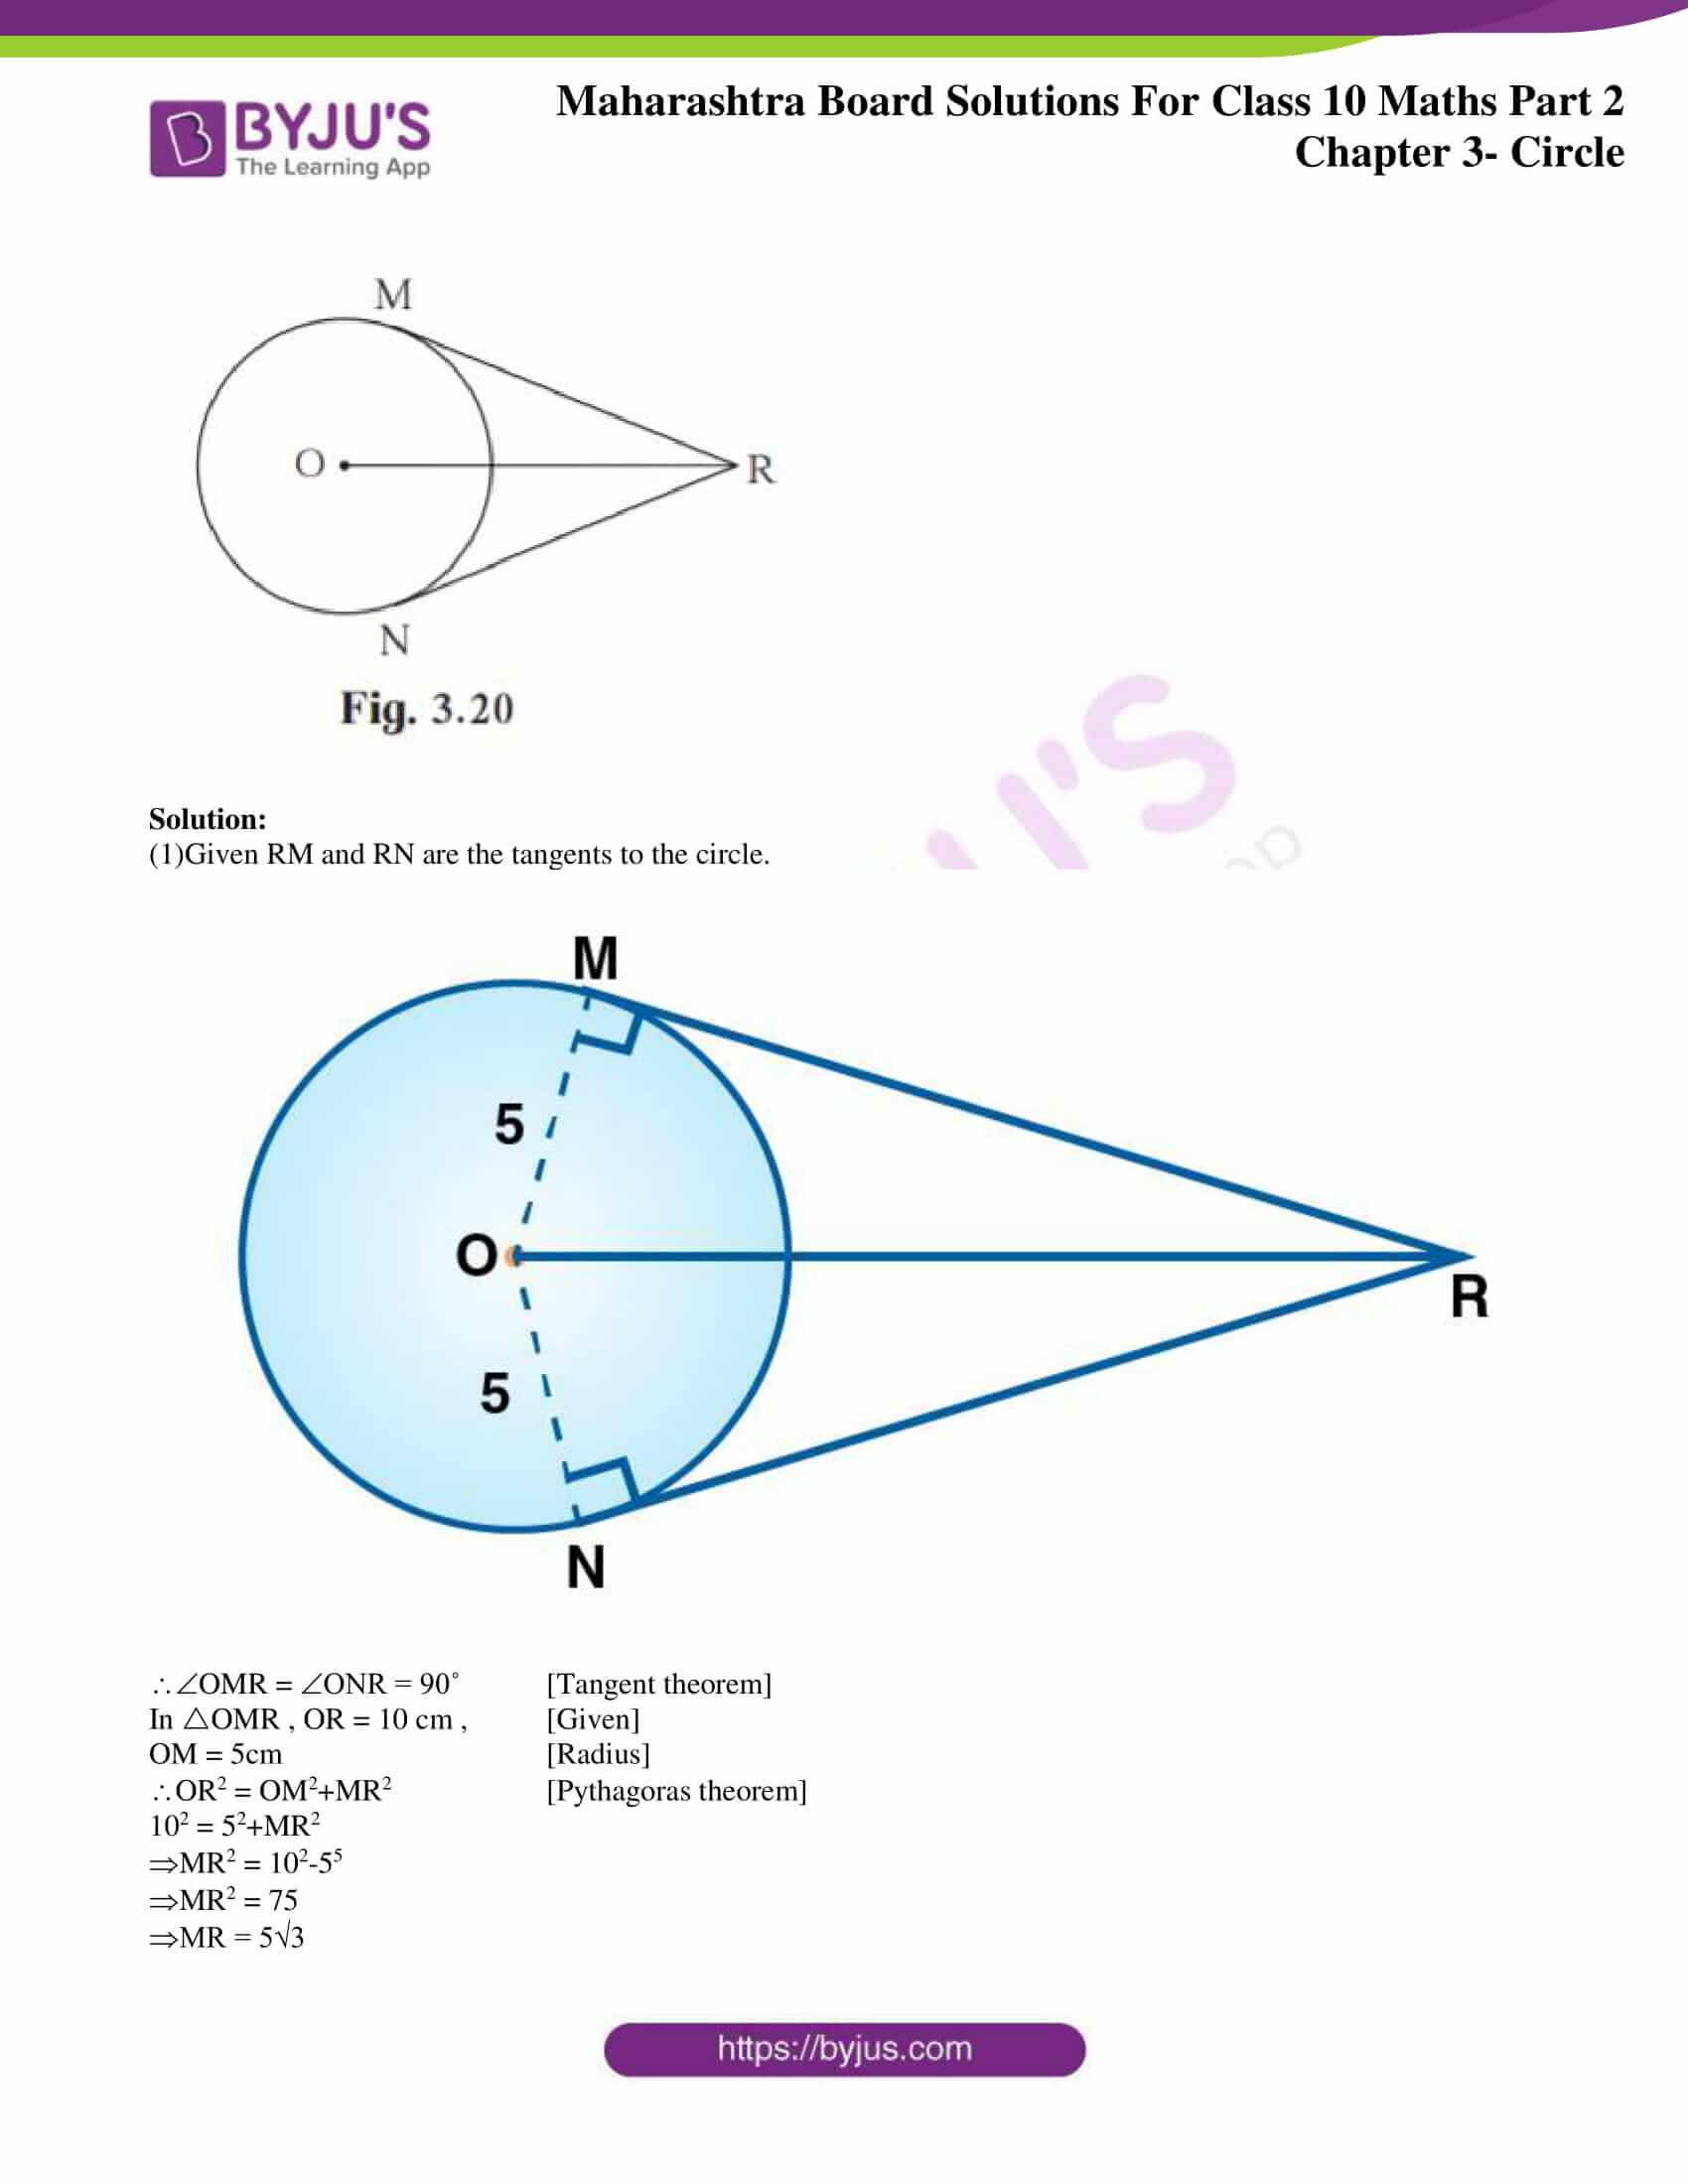 msbshse sol class 10 maths part 2 chapter 3 03